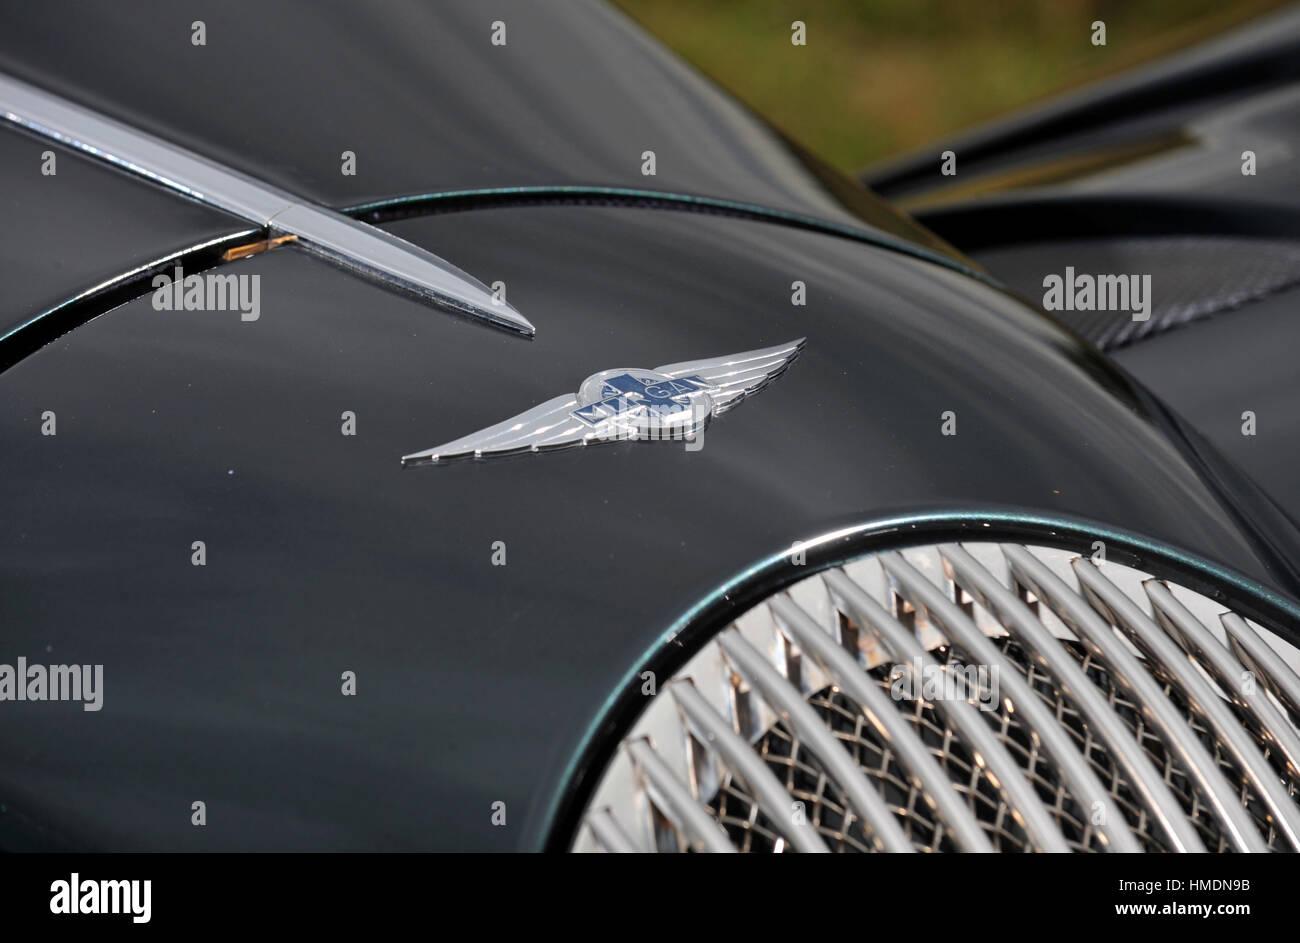 2010 Morgan Aero retro styled British V8 sports car badge - Stock Image